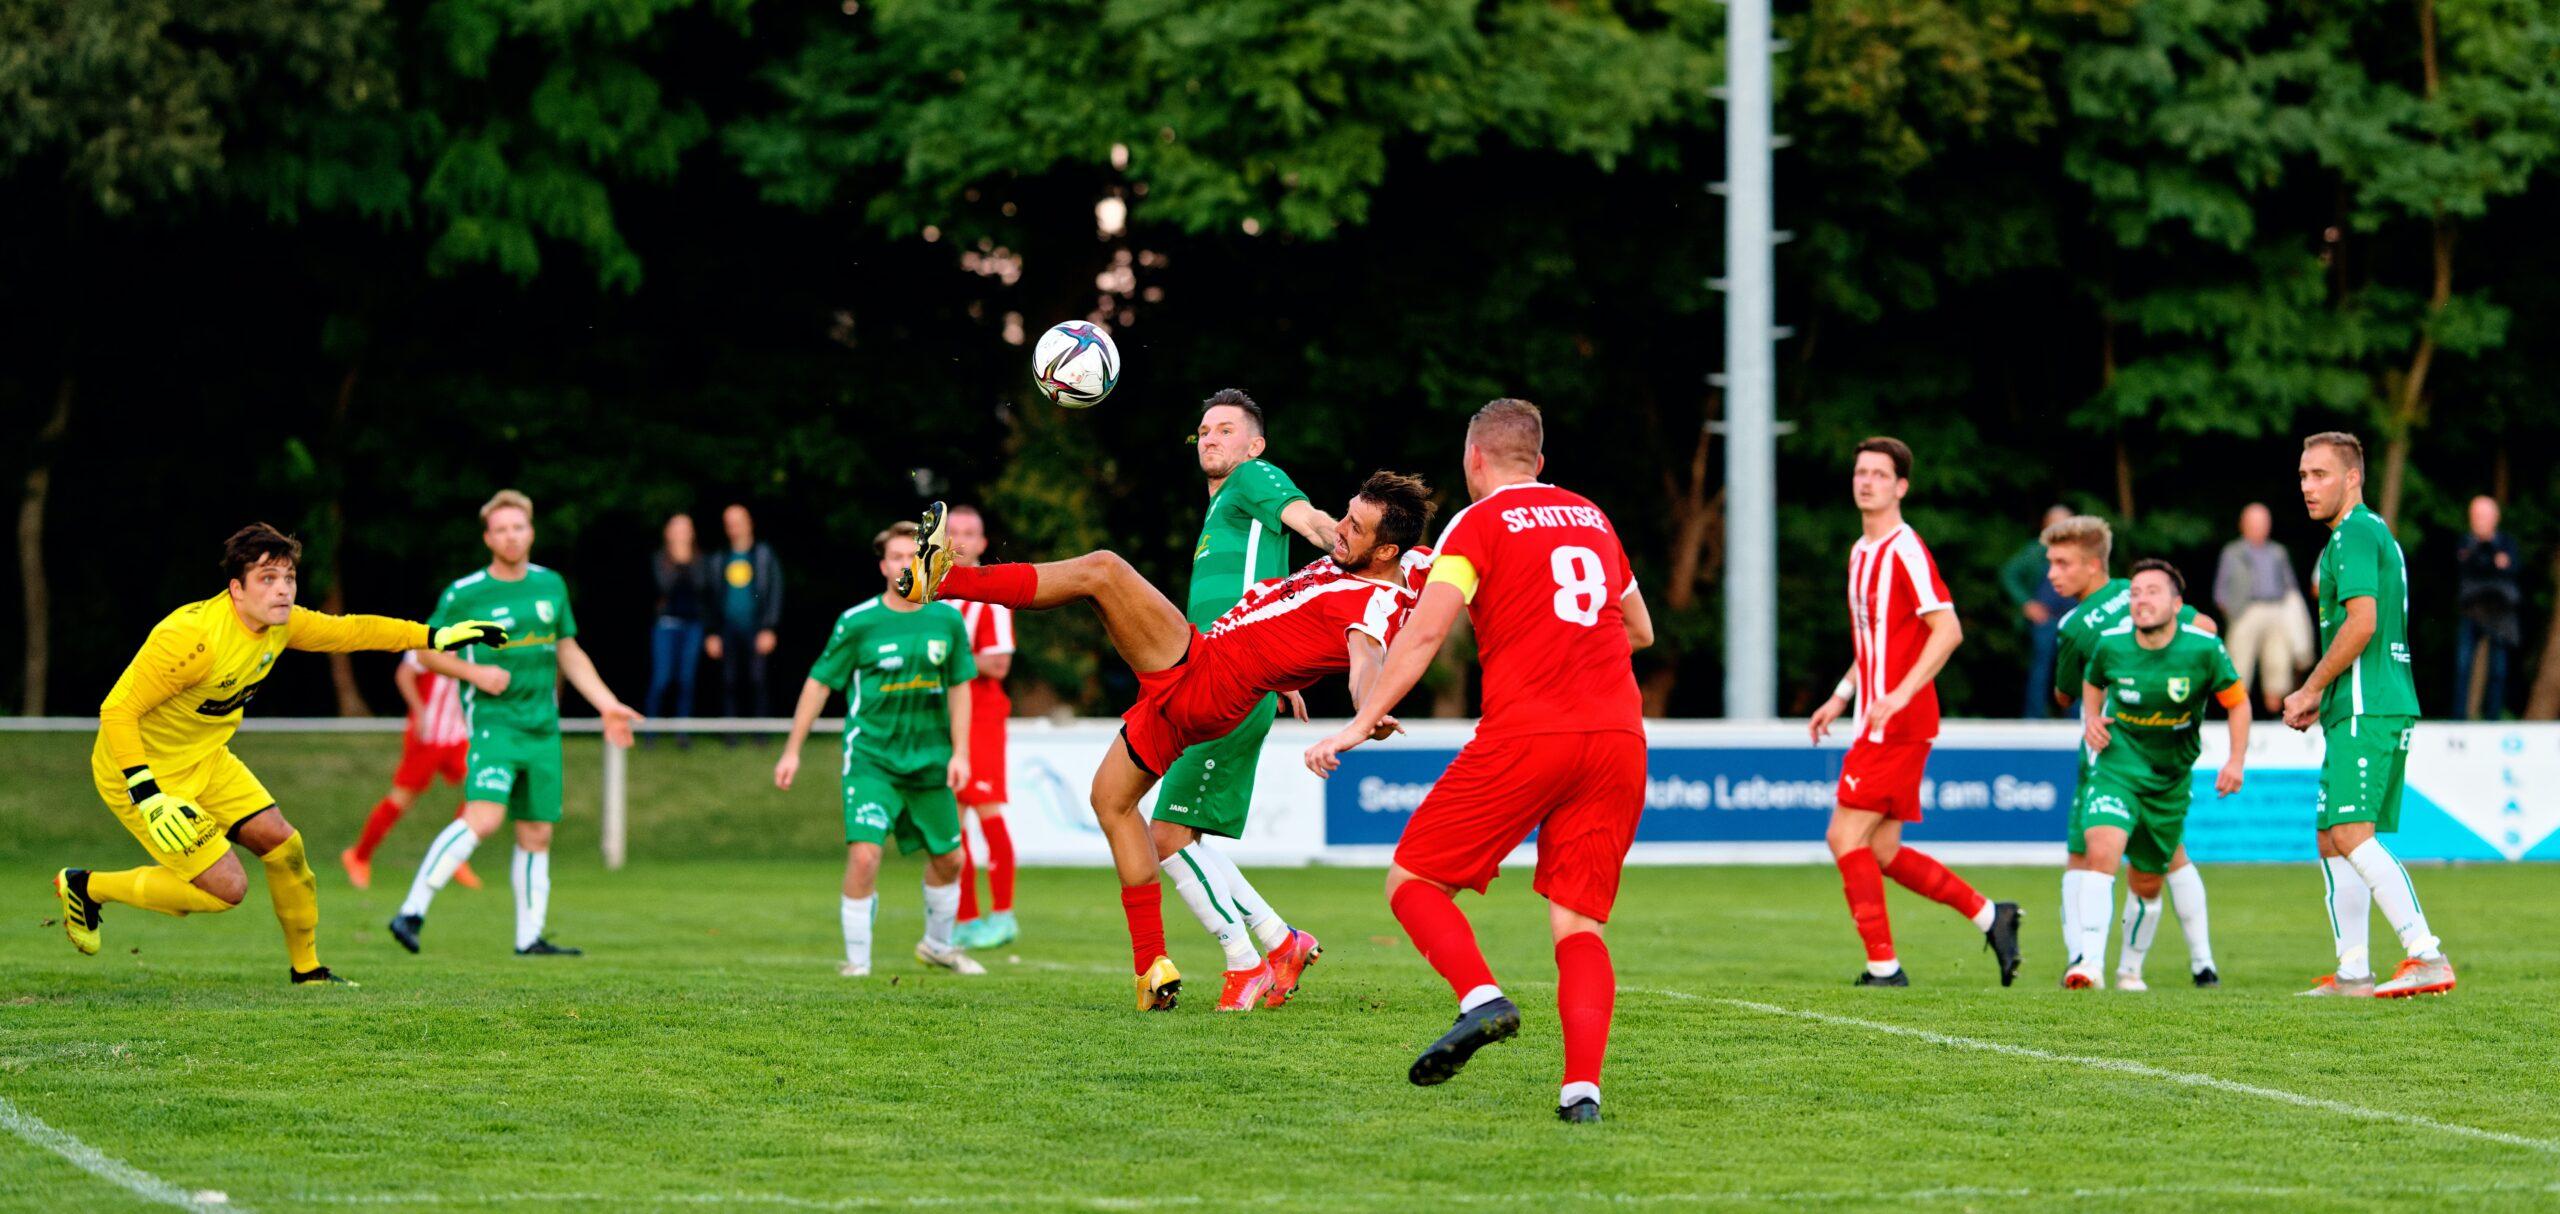 Filip Balazi takes down Jaroslav Machovec